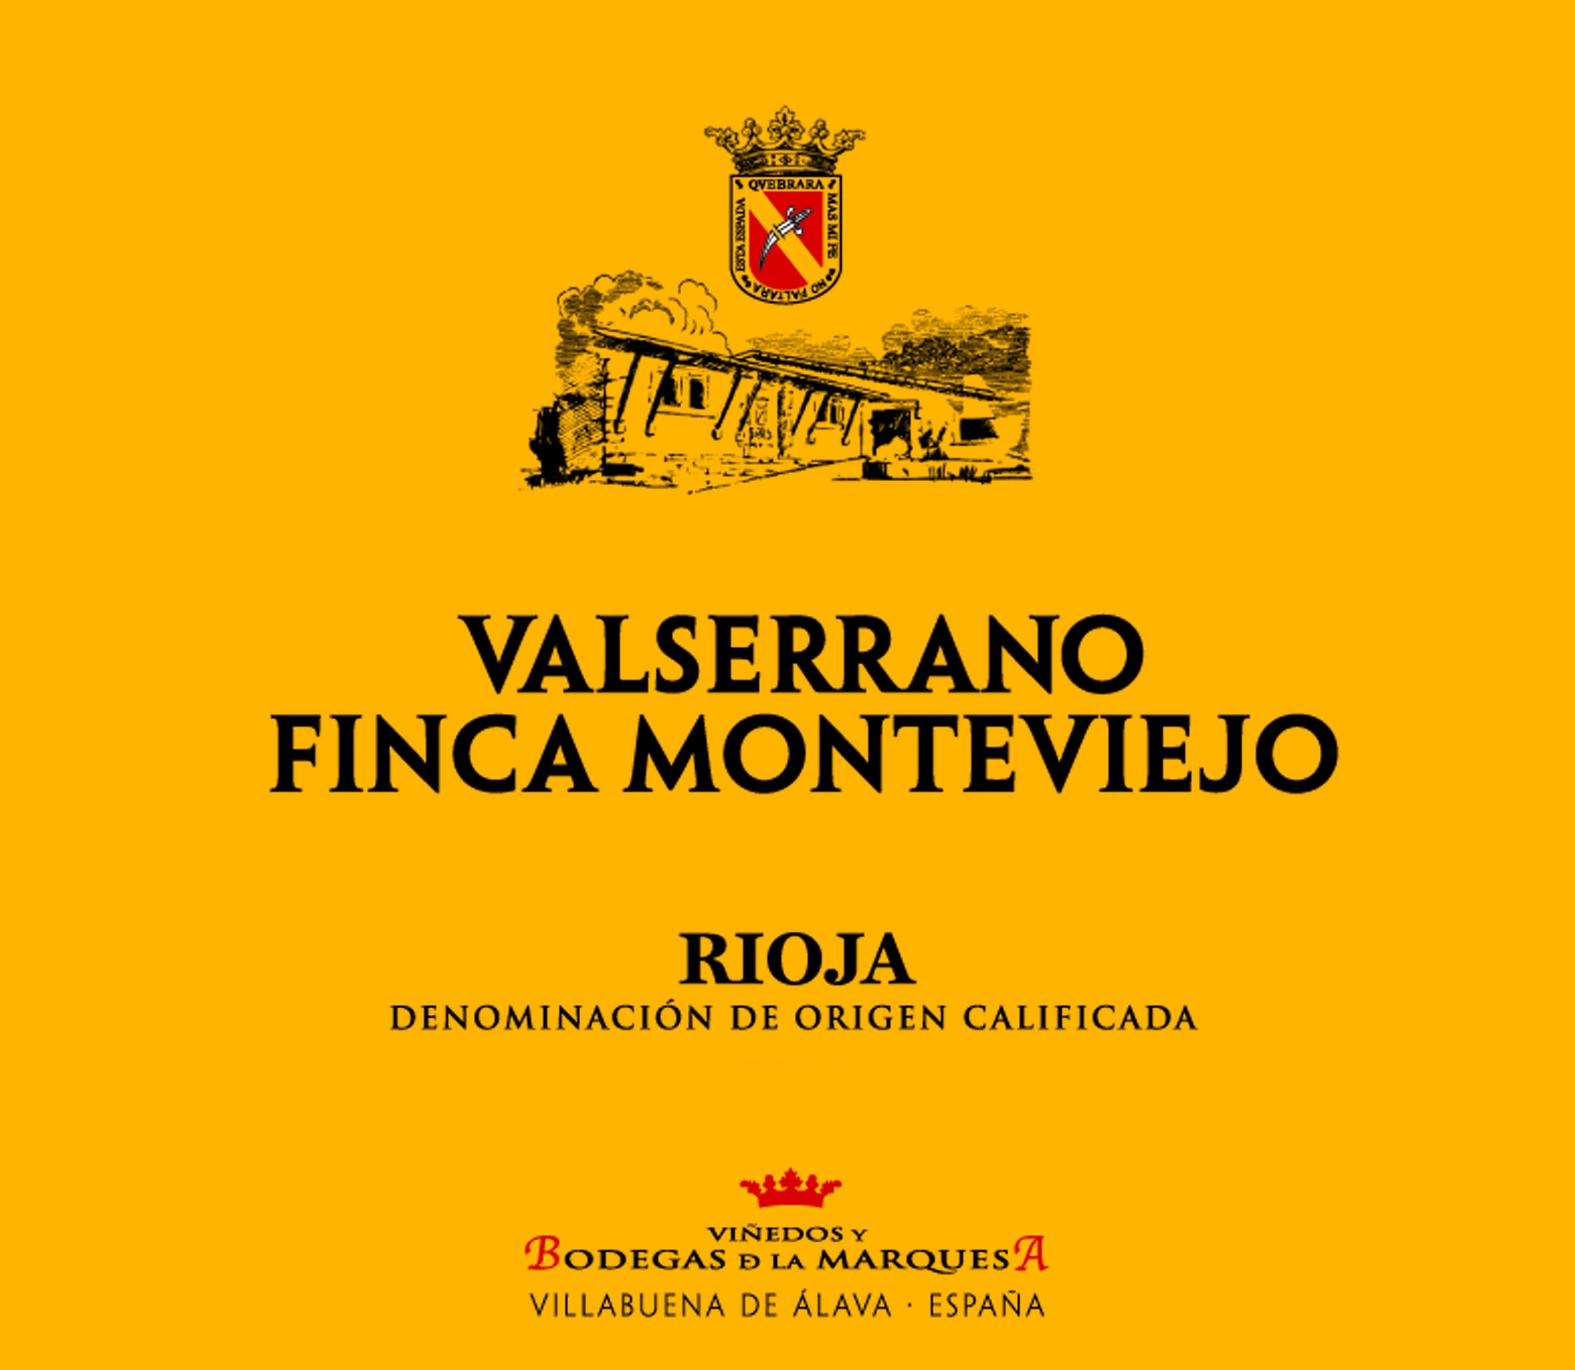 Valserrano Finca Monteviejo 2016